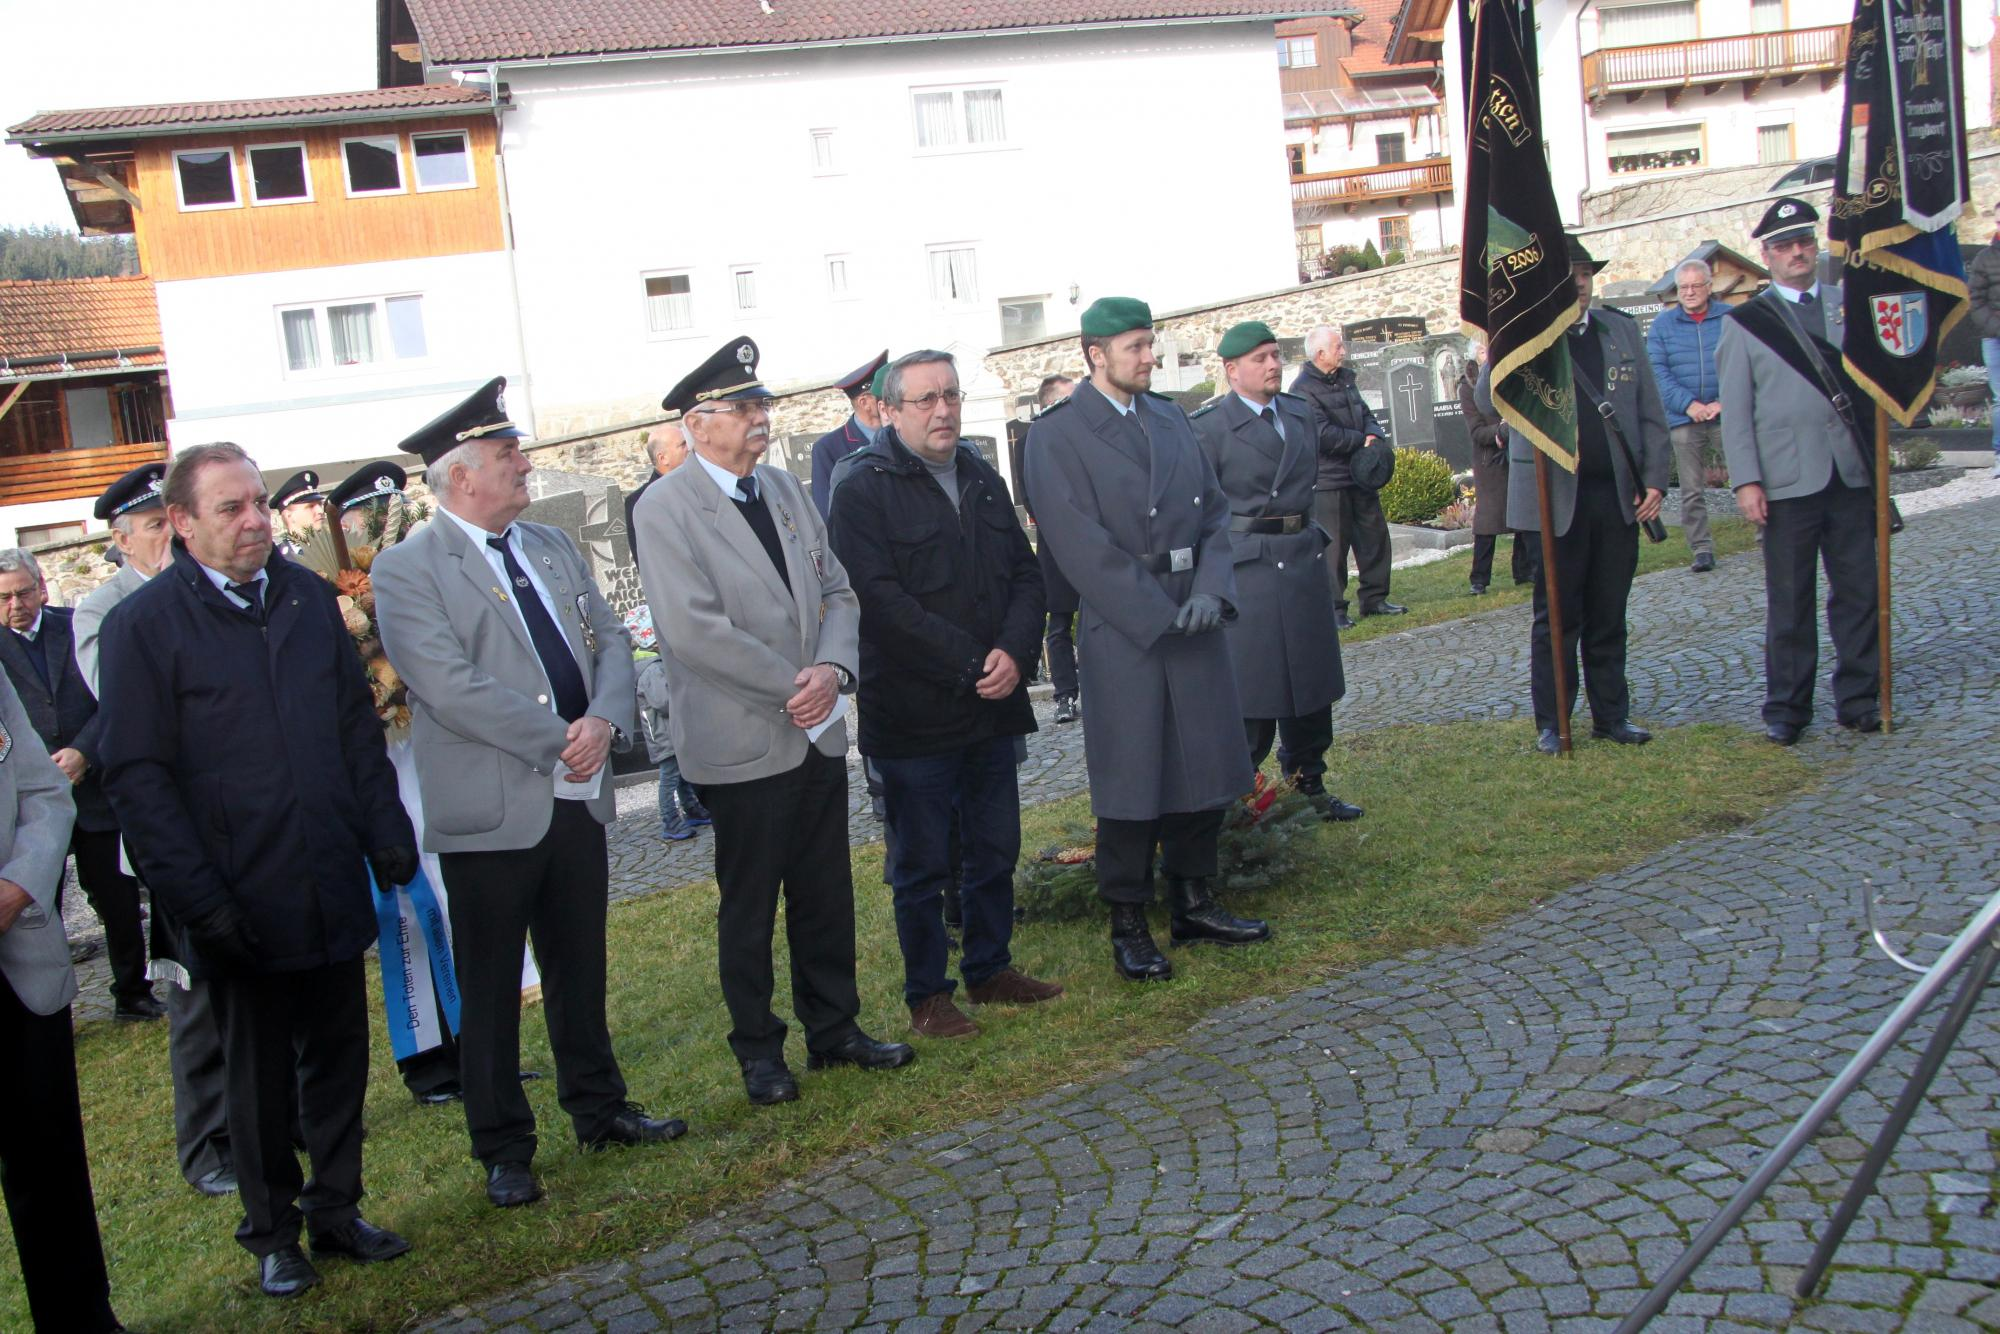 V.l.: 1. Bgm. Otto Probst, Erich Probst, Fred Schorn, 1. Vors. VdK-OV Langdorf, Hptm Marian Riediger